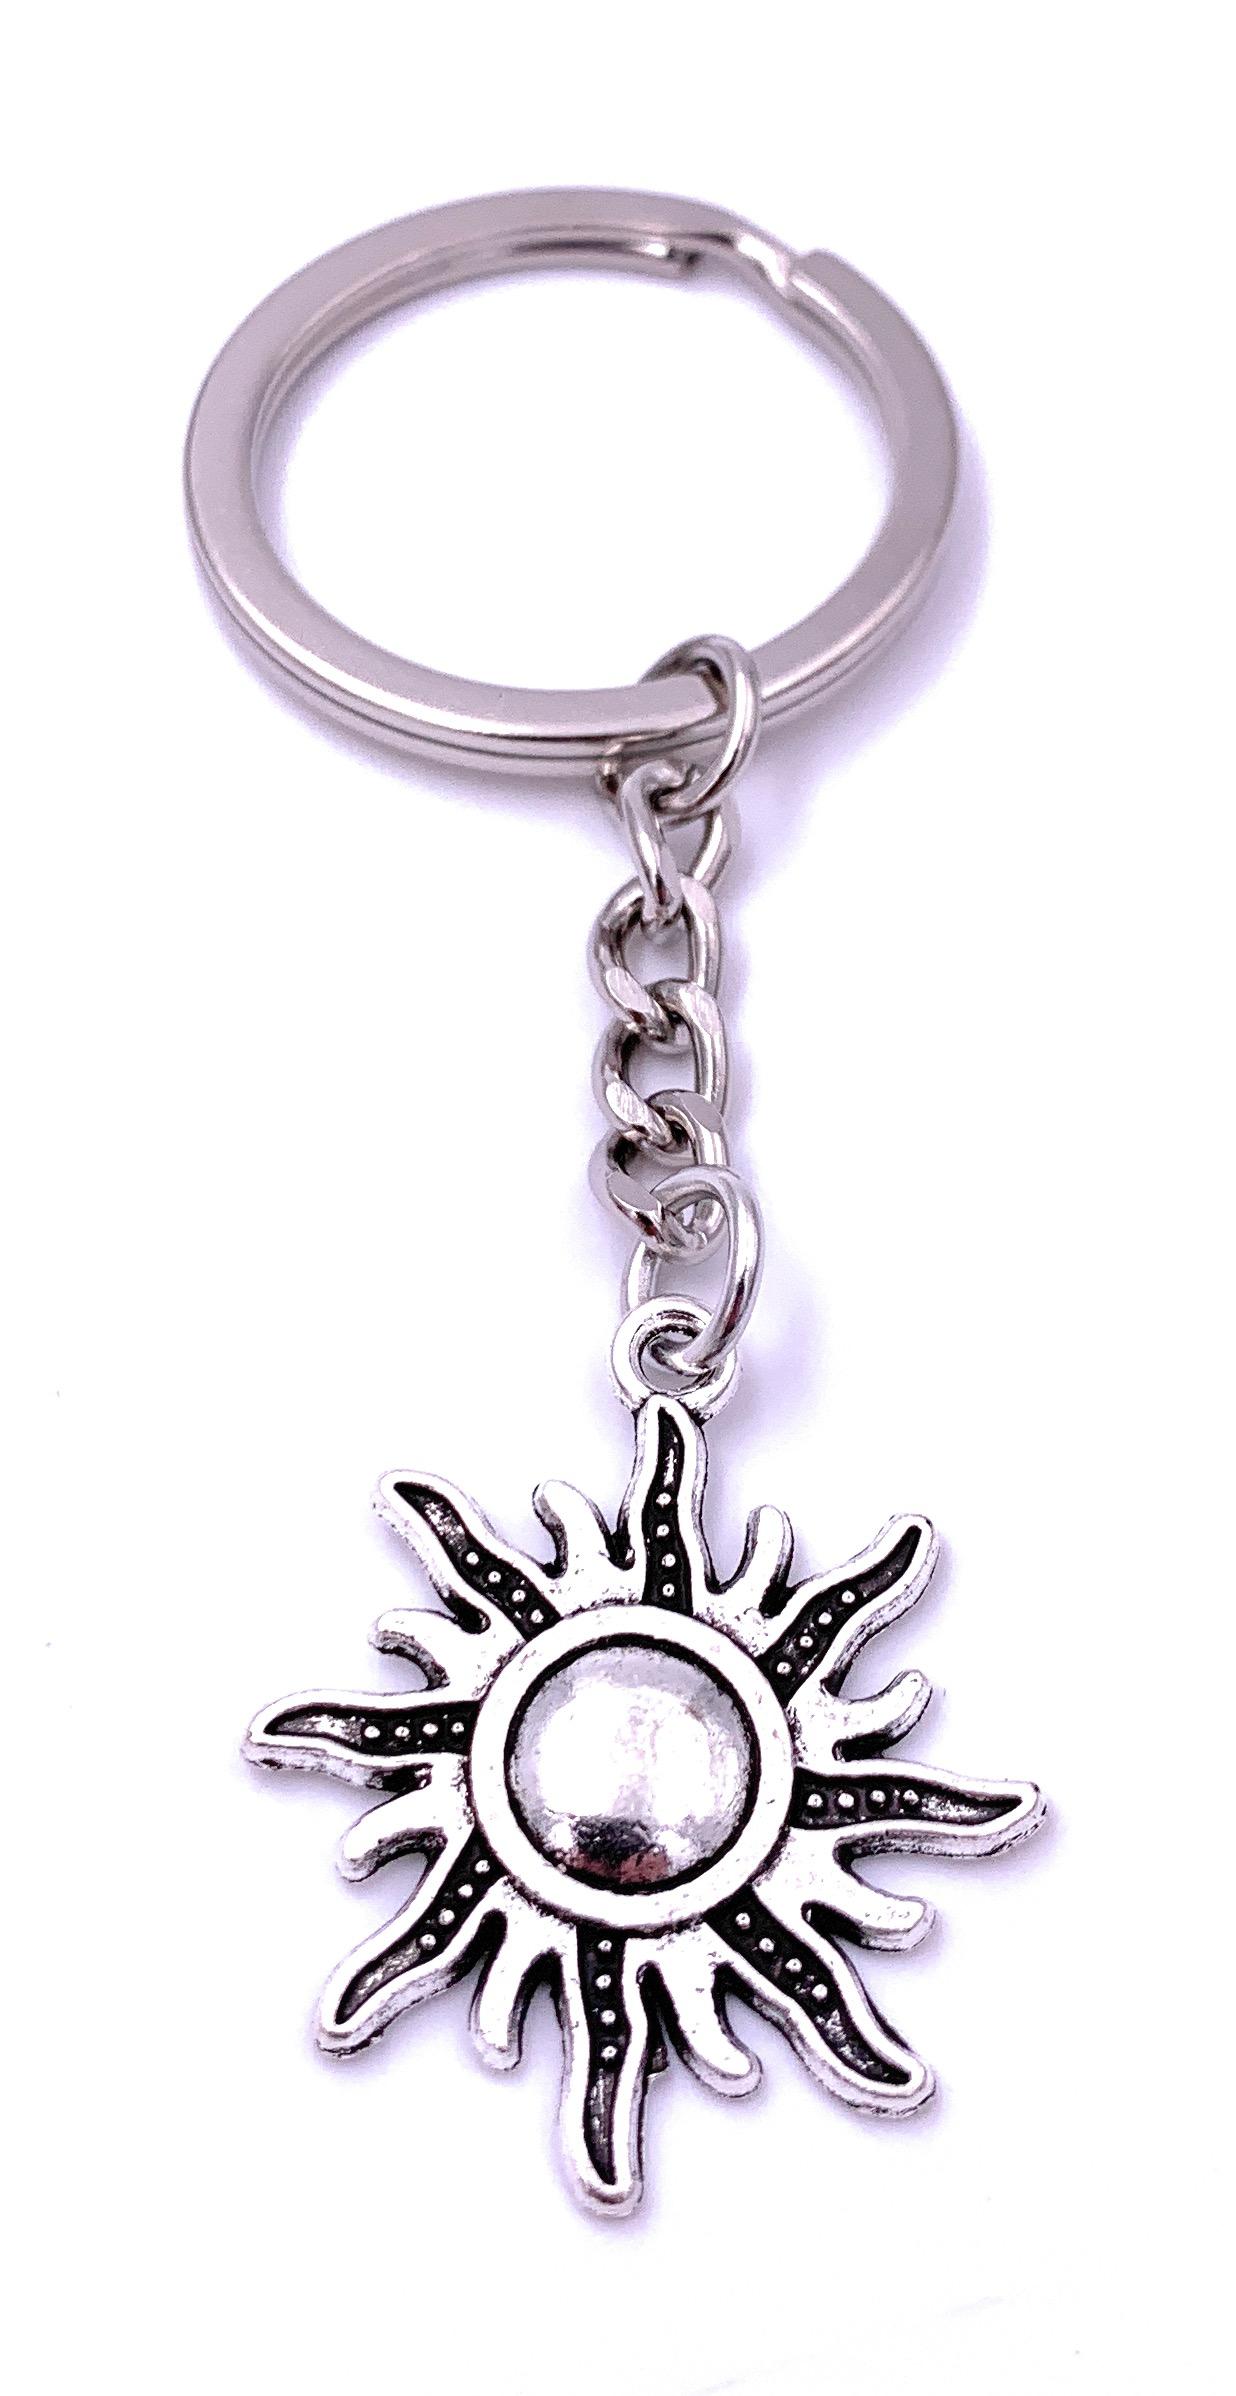 Schmetterling Schlüsselanhänger Anhänger Silber aus Metall